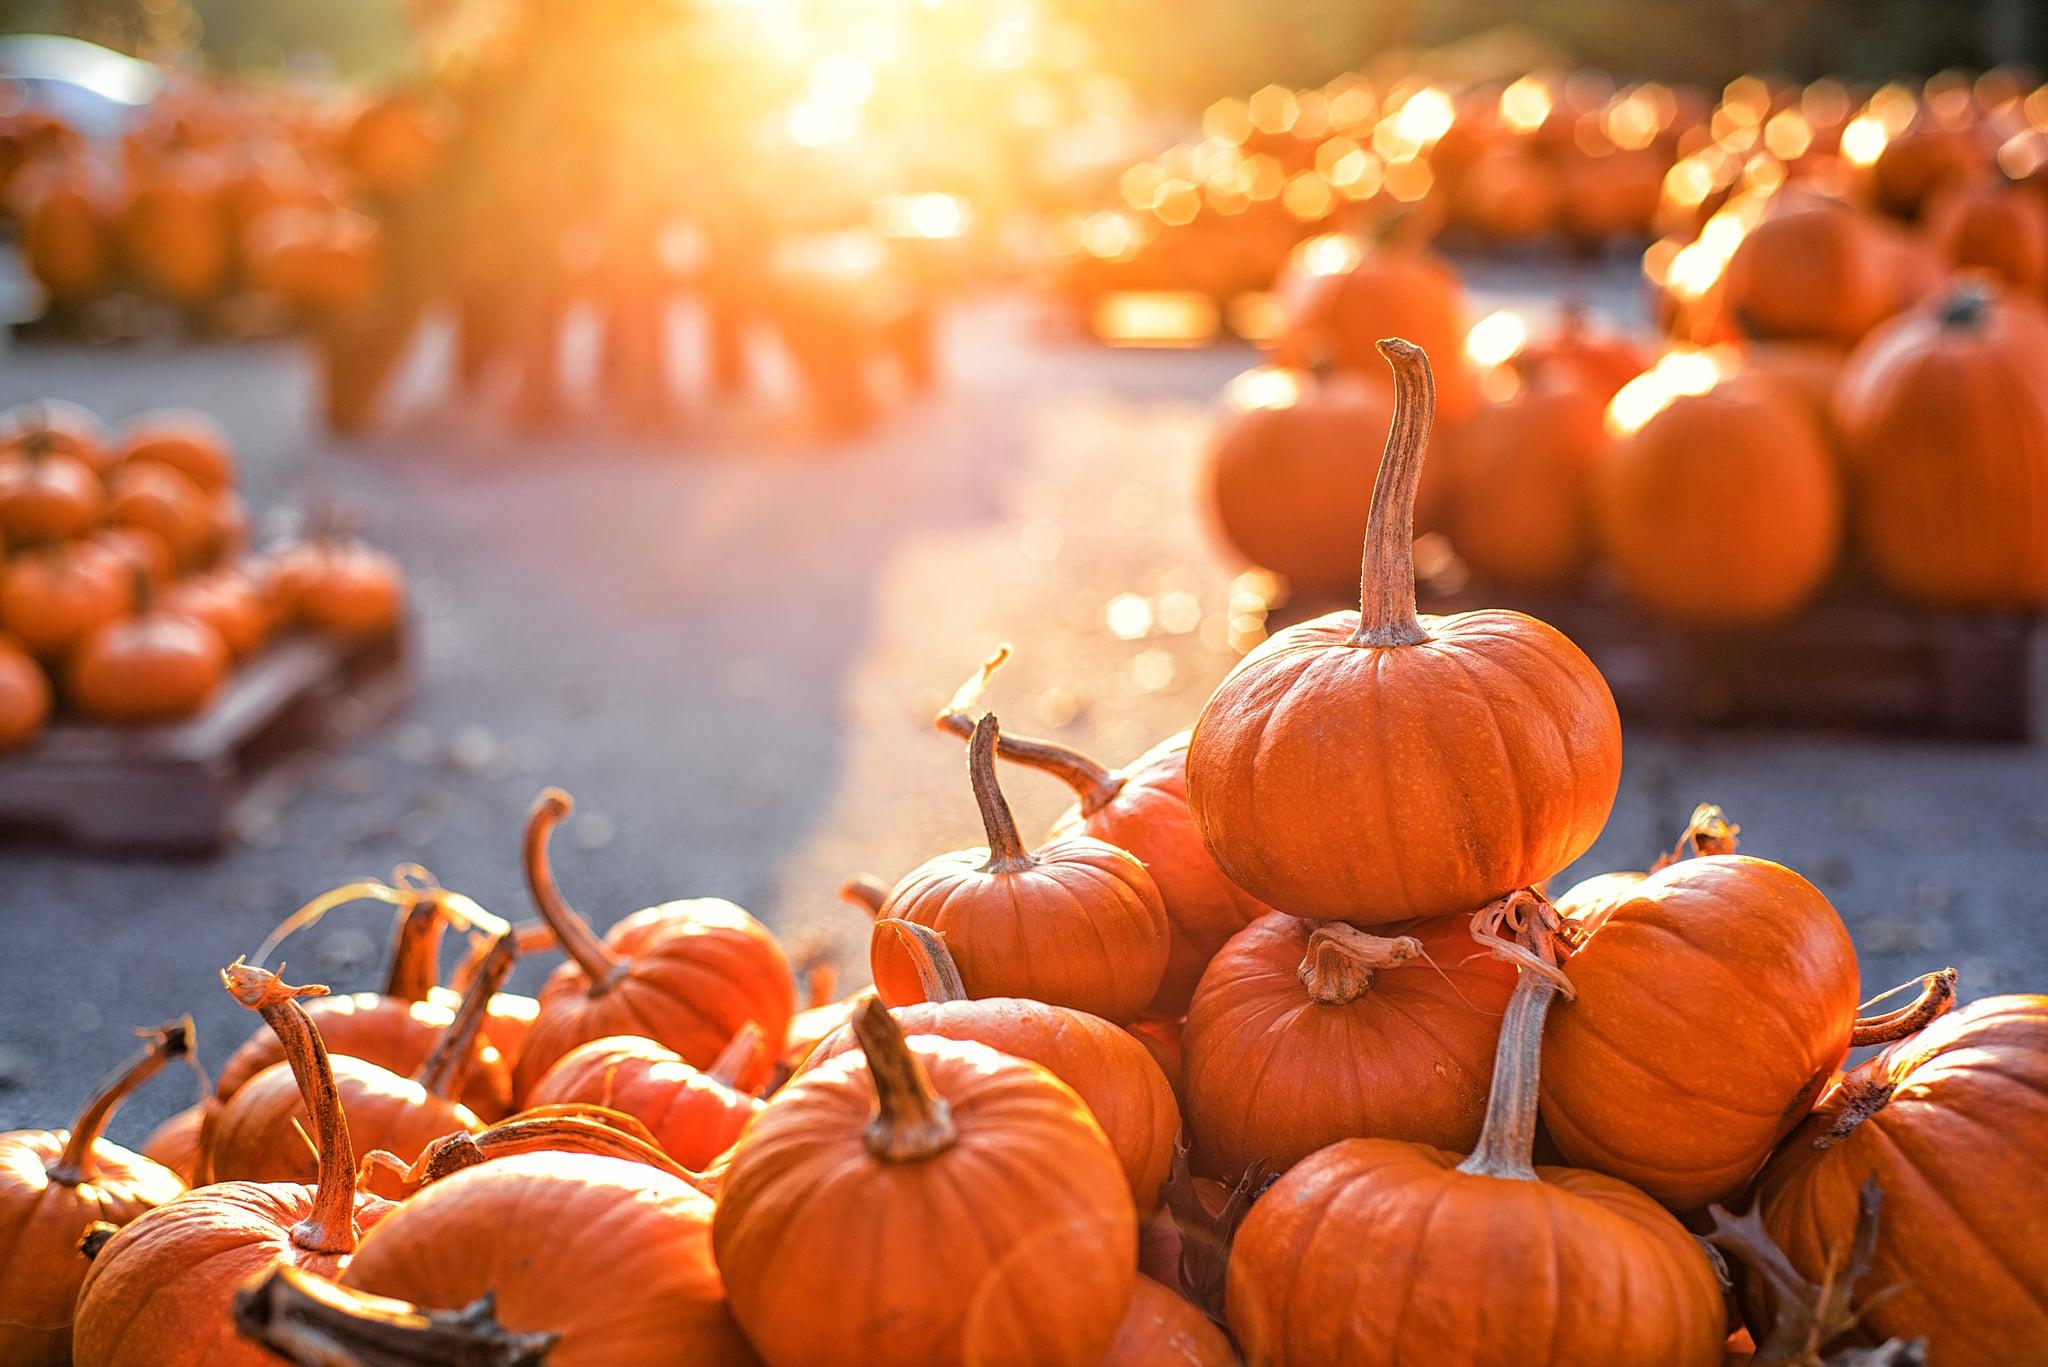 A pile of bright orange pumpkins on a pumpkin patch basking in sunlight